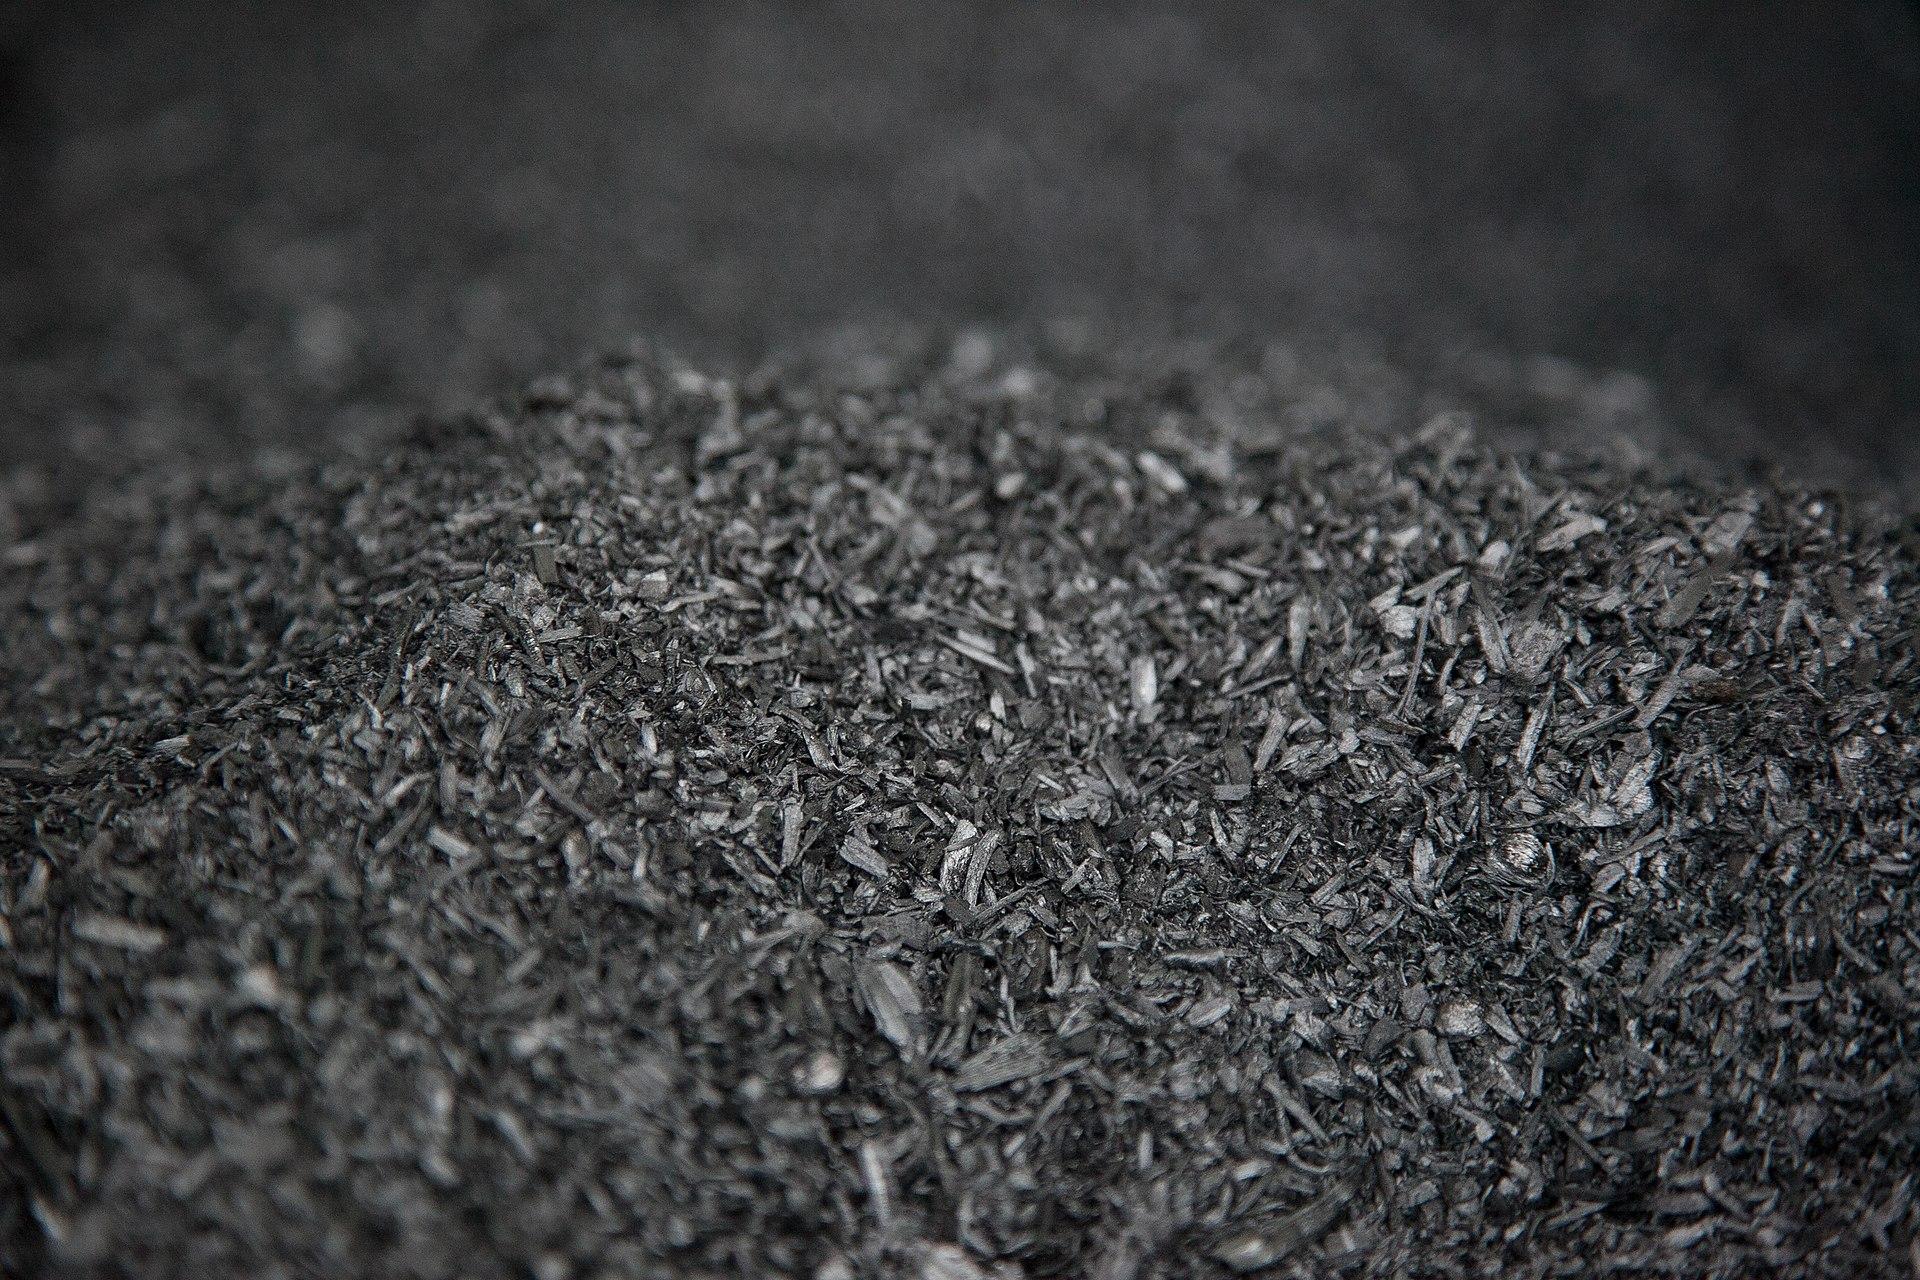 A large pile of biochar